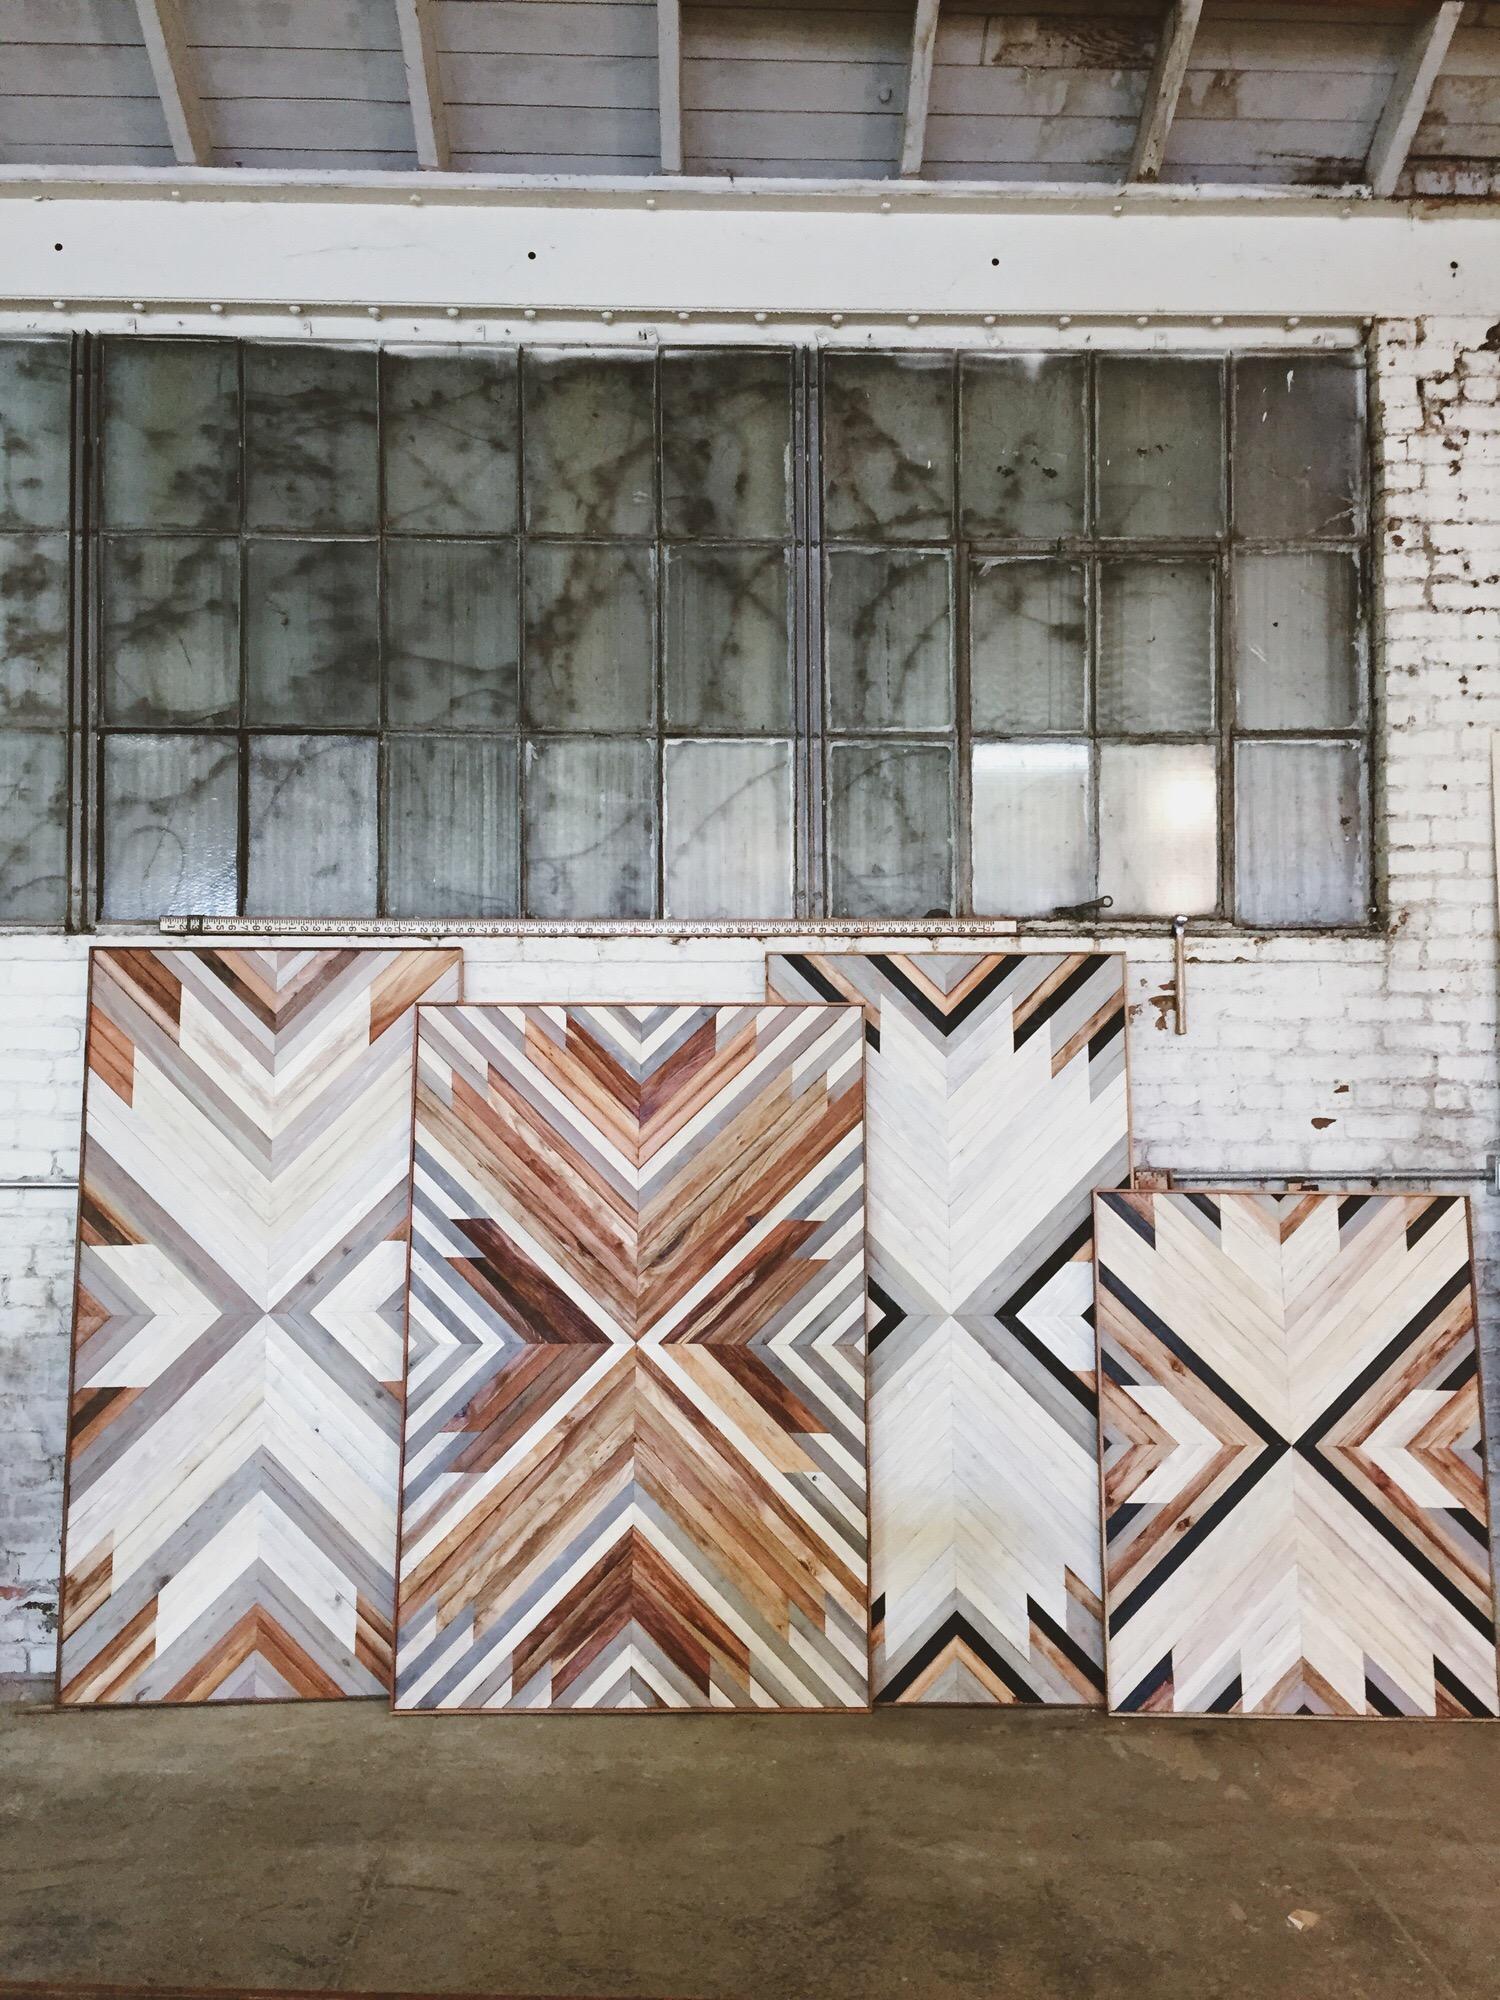 diy wood wall art building briggs. Black Bedroom Furniture Sets. Home Design Ideas